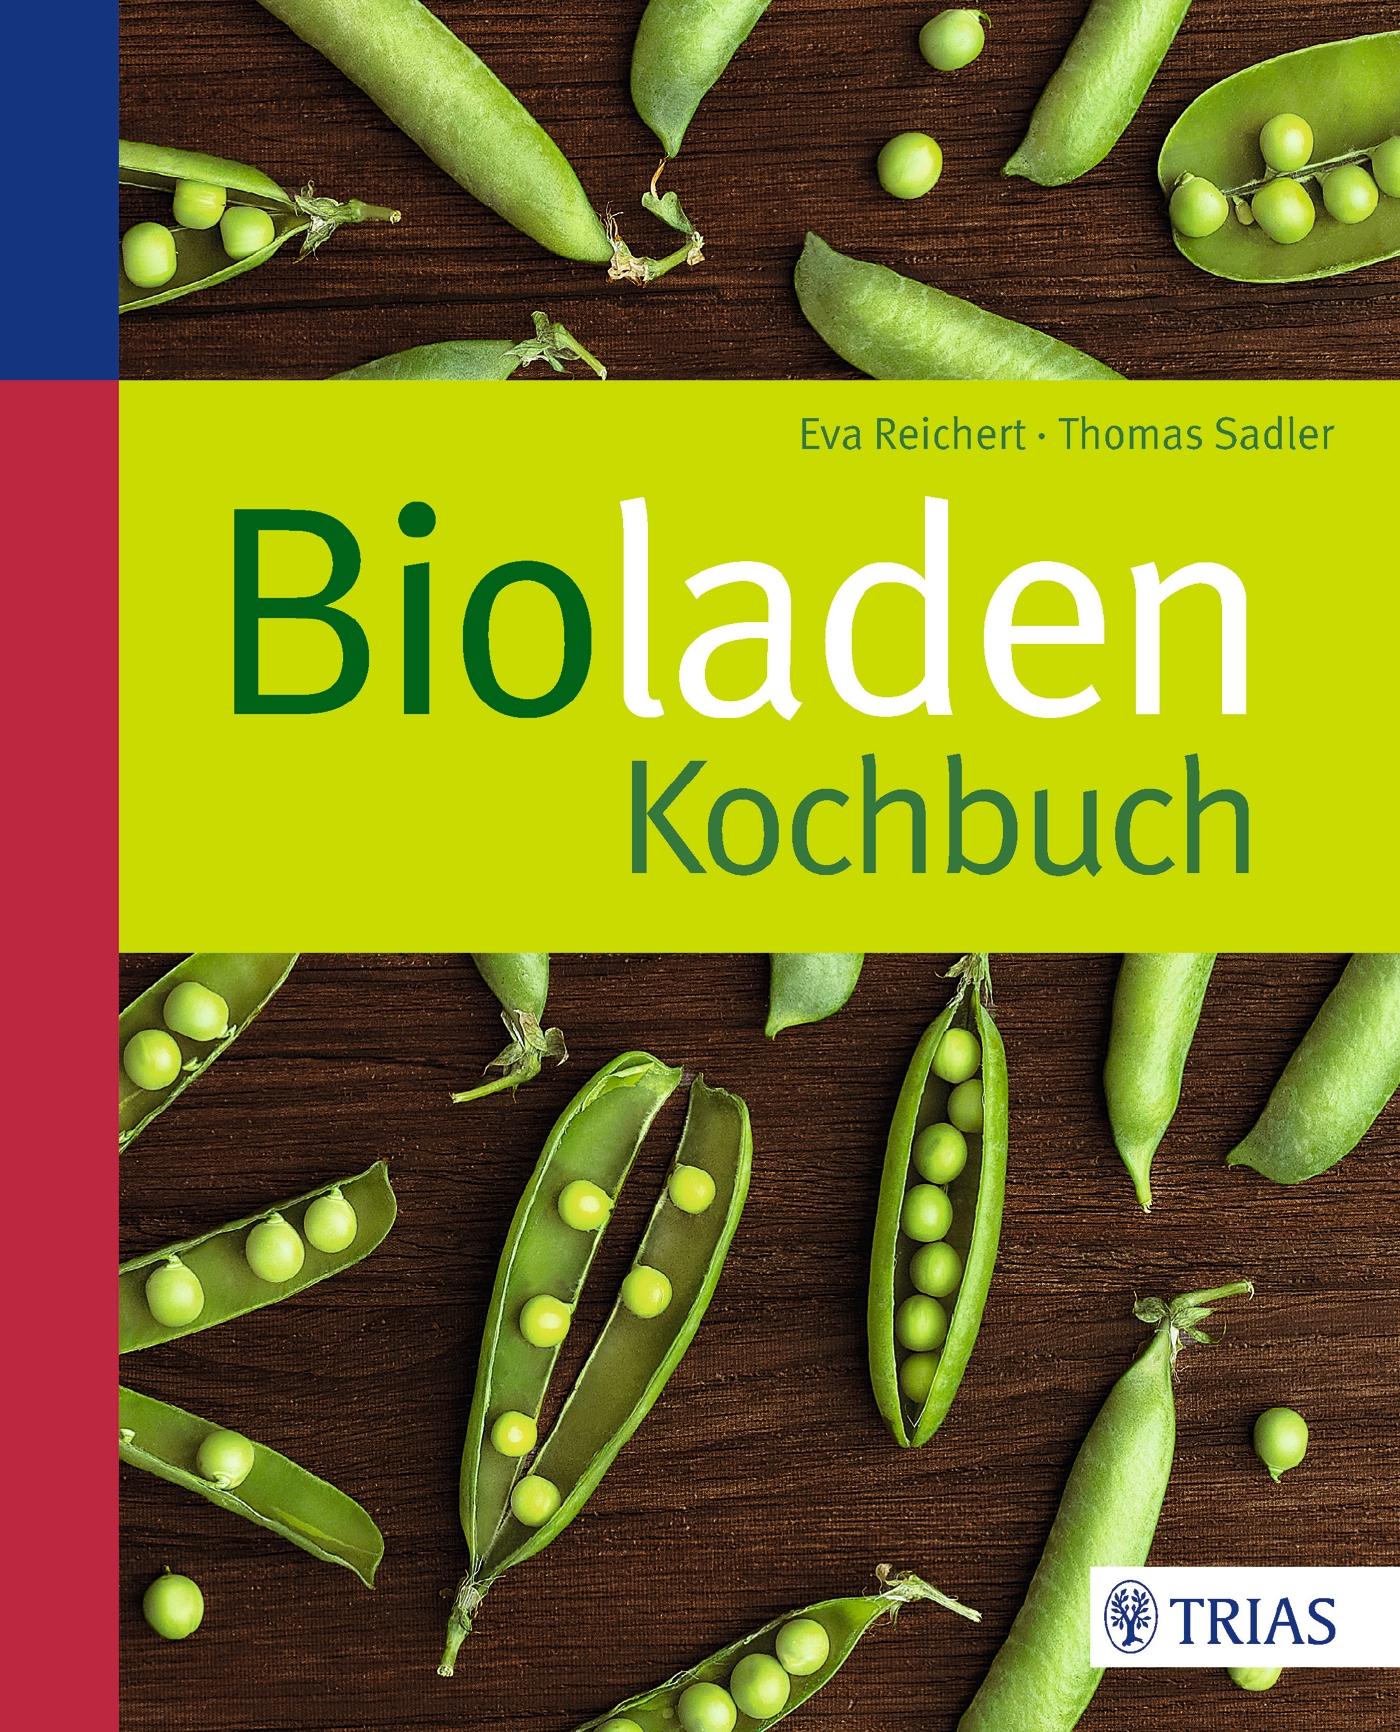 Bioladen-Kochbuch - Reichert, Eva